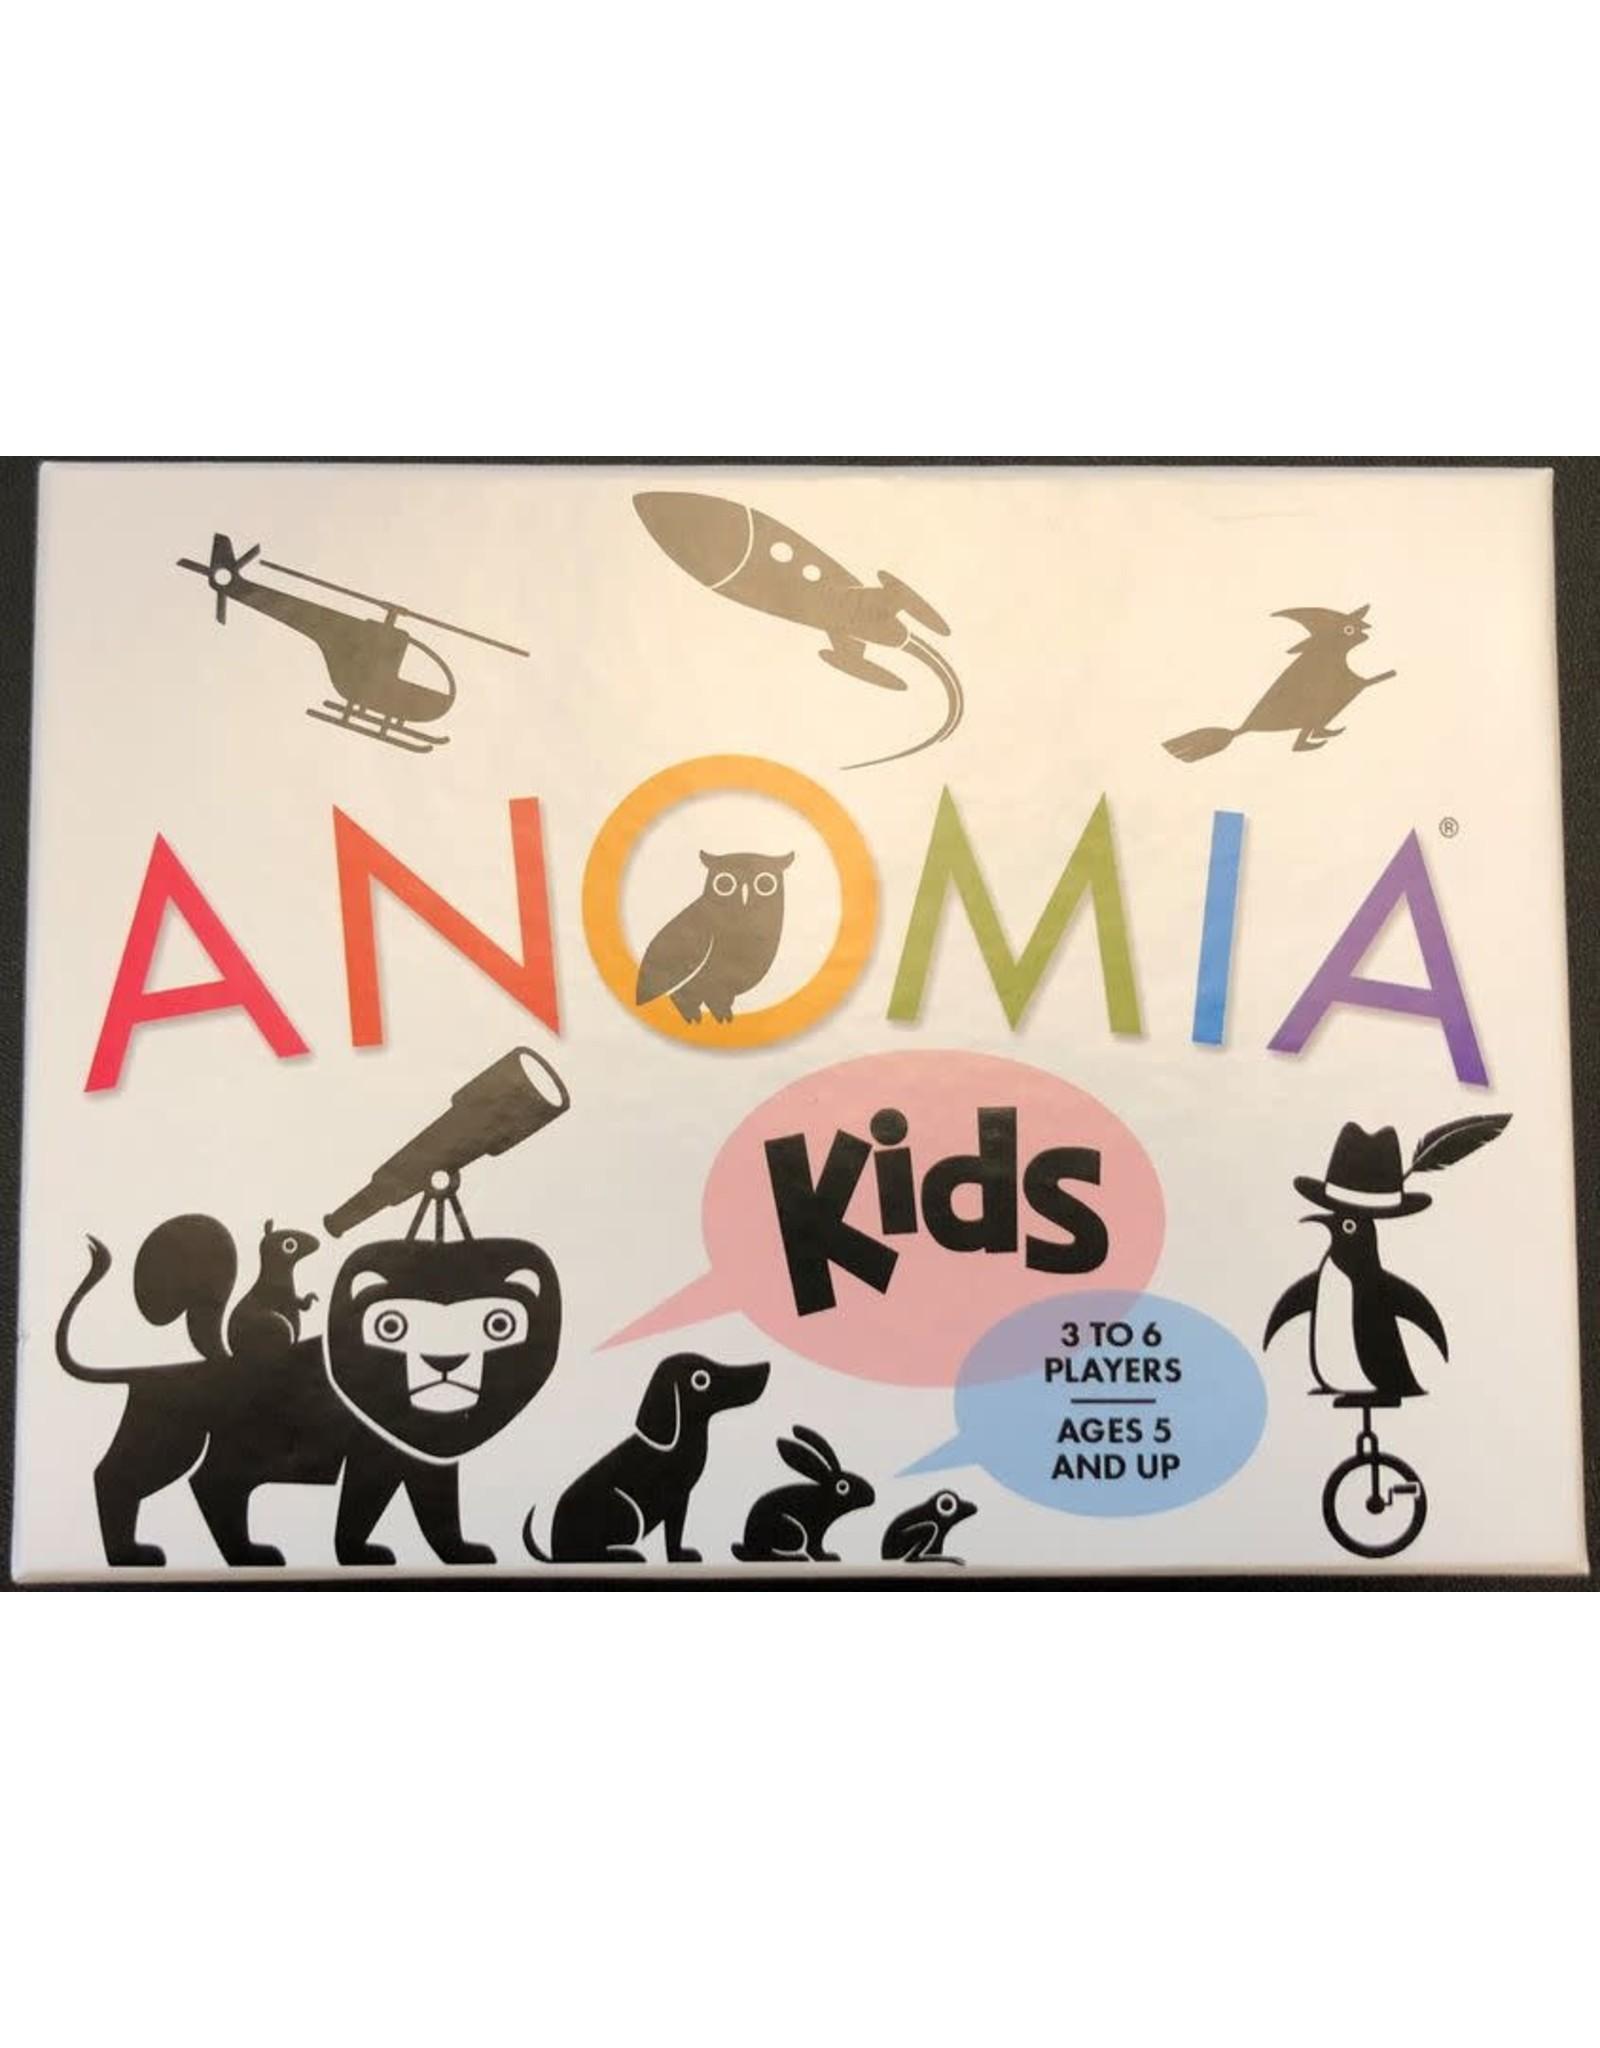 ANOMIA KIDS